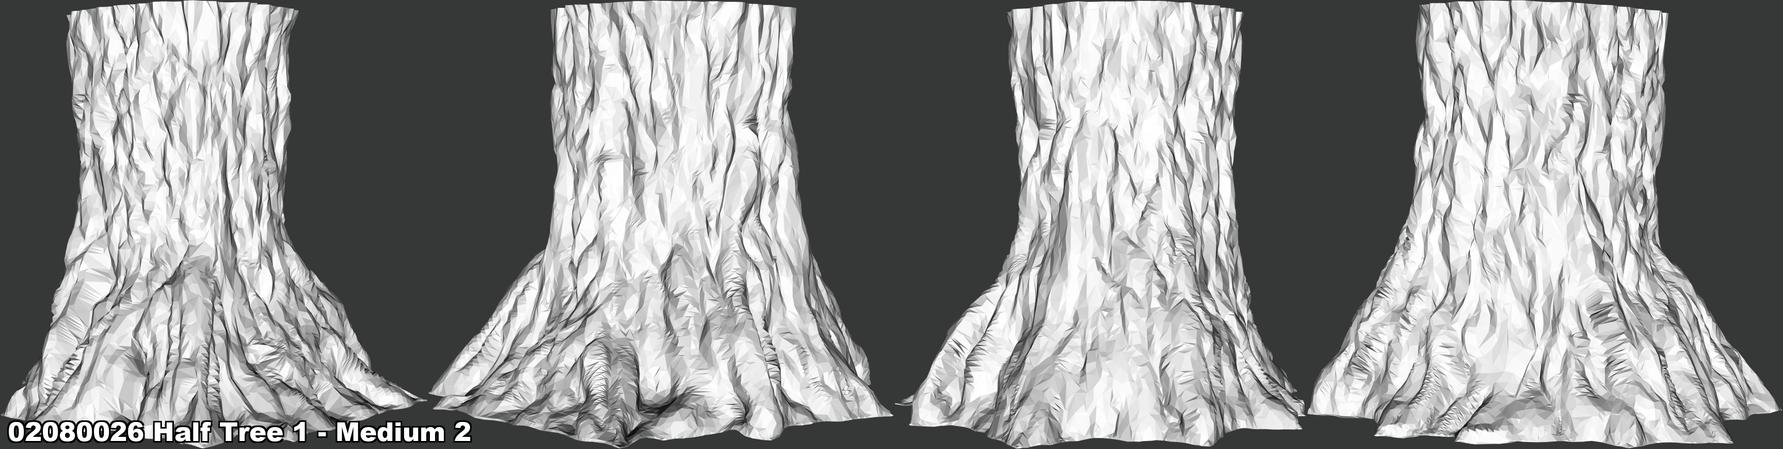 02080026 Half Tree 1 - Medium 2.png